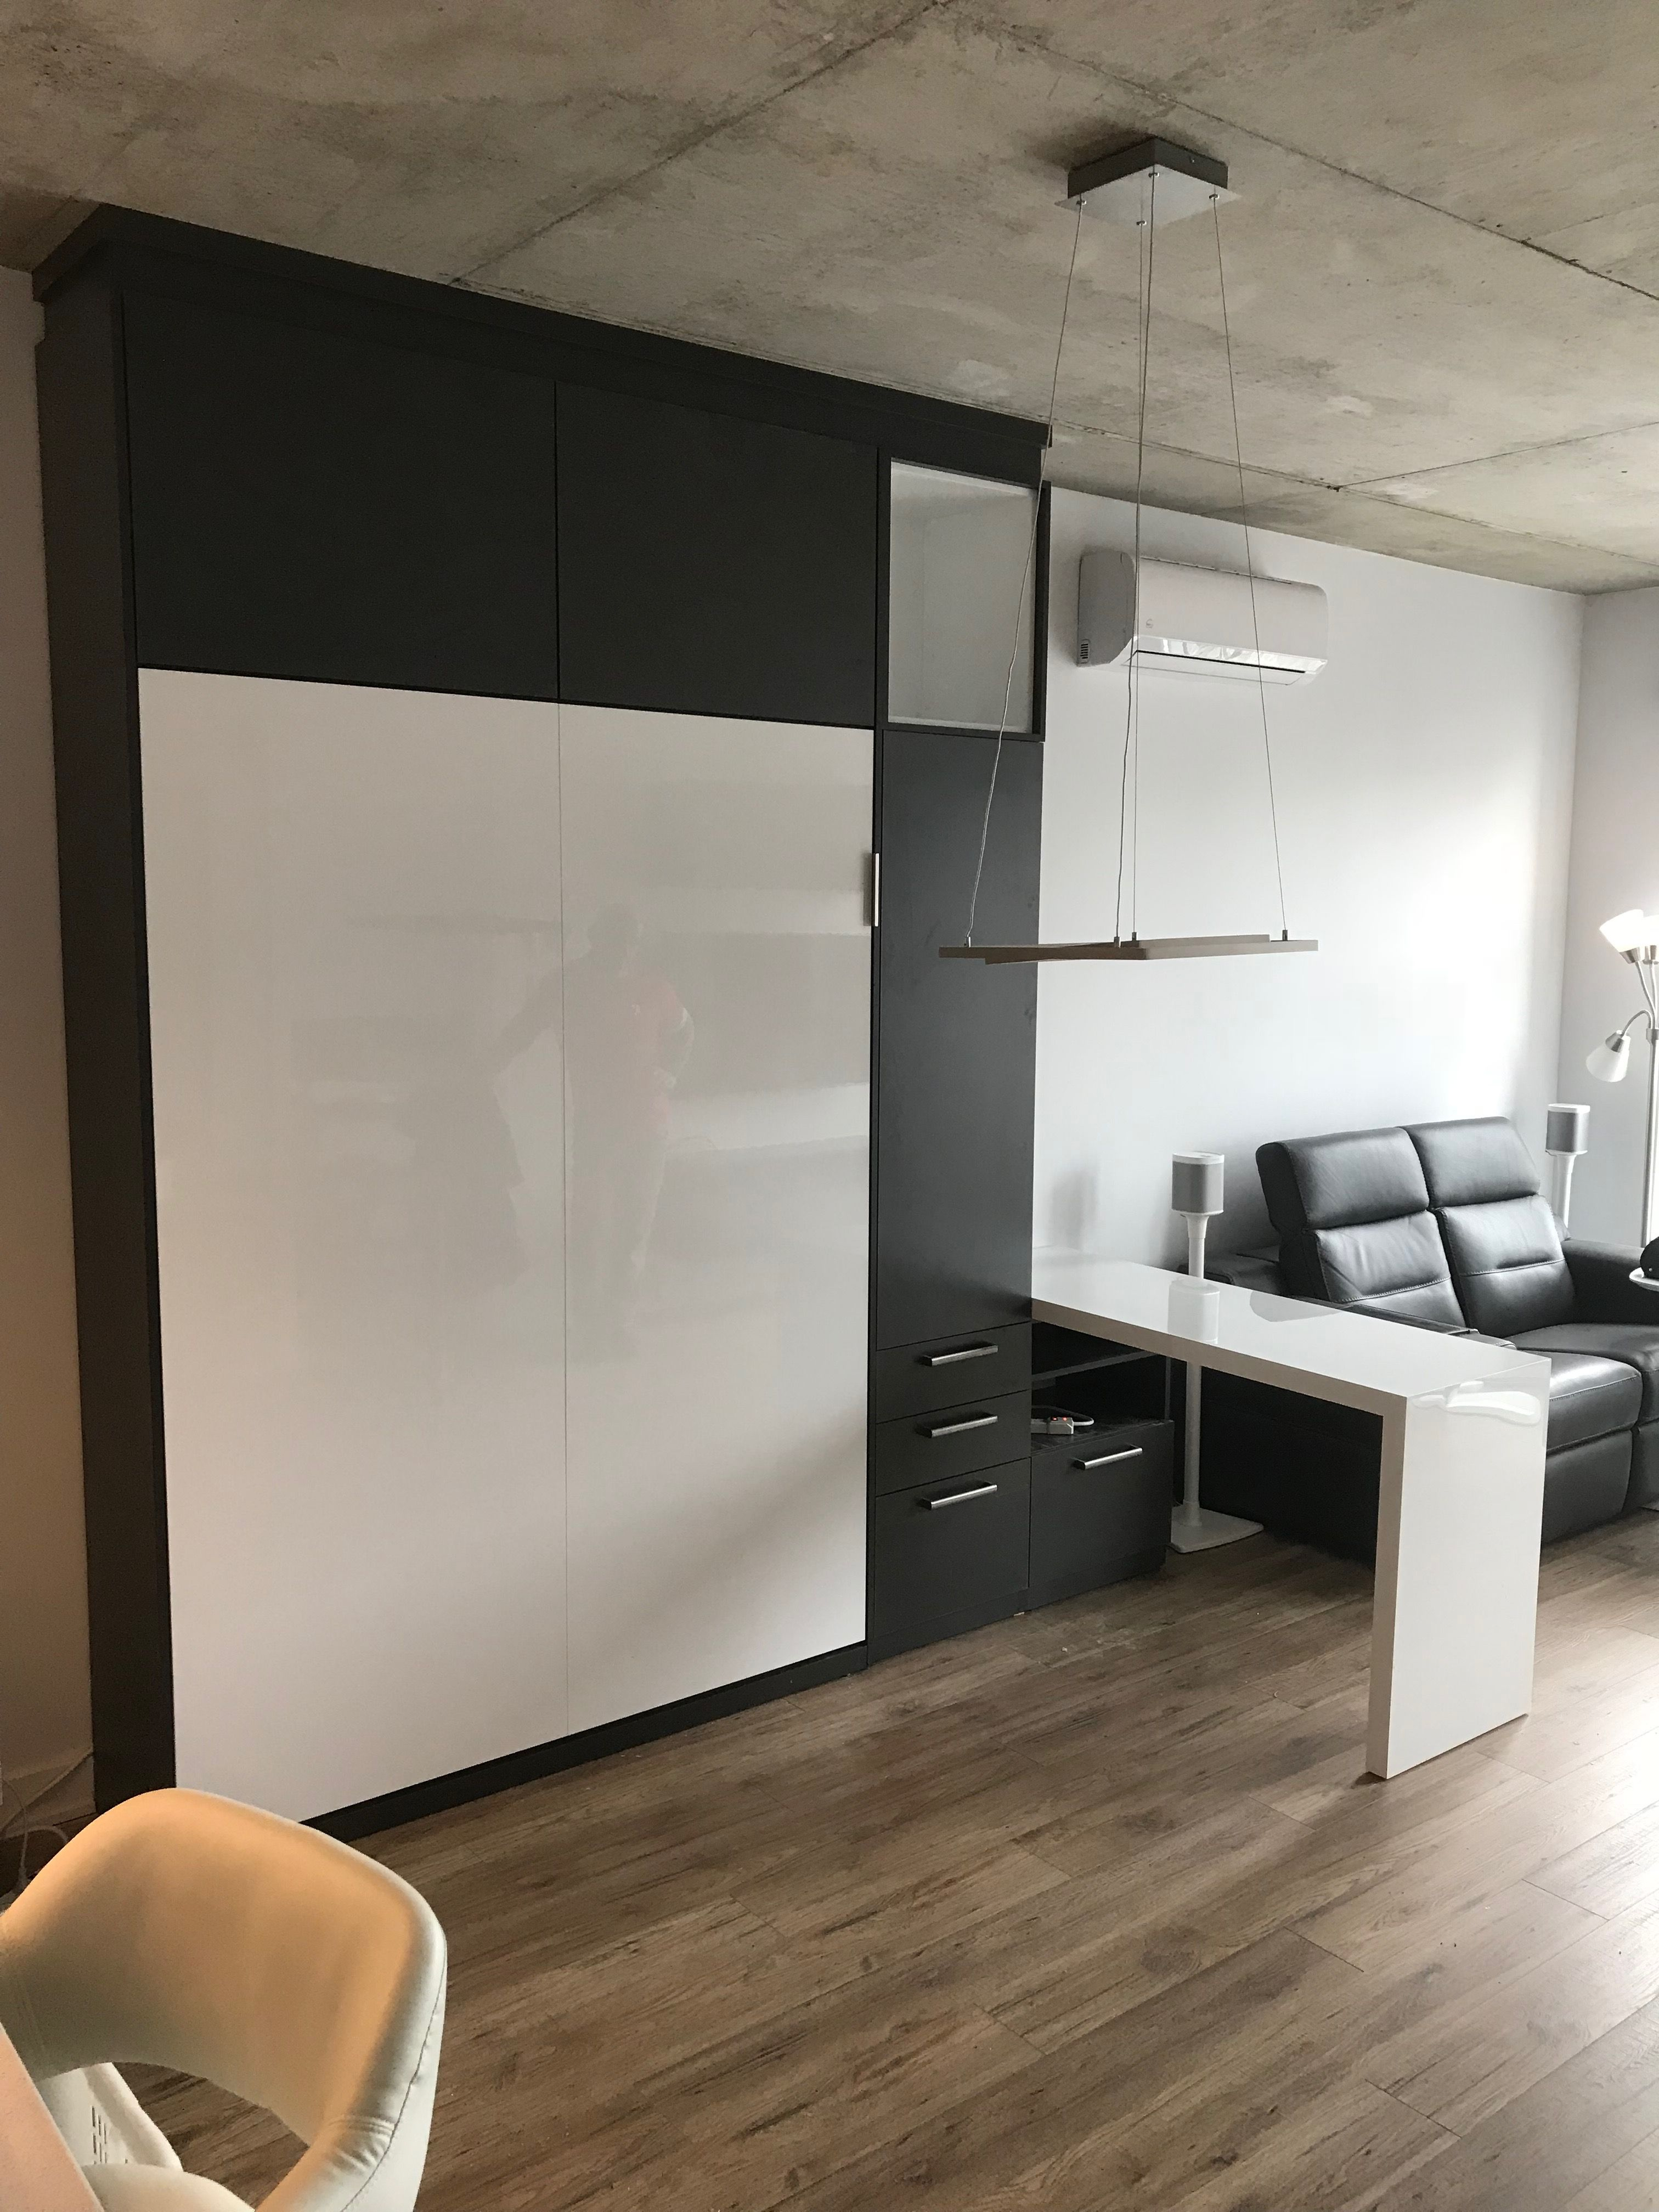 Lit Mural Bureau Home Decor Home Room Divider